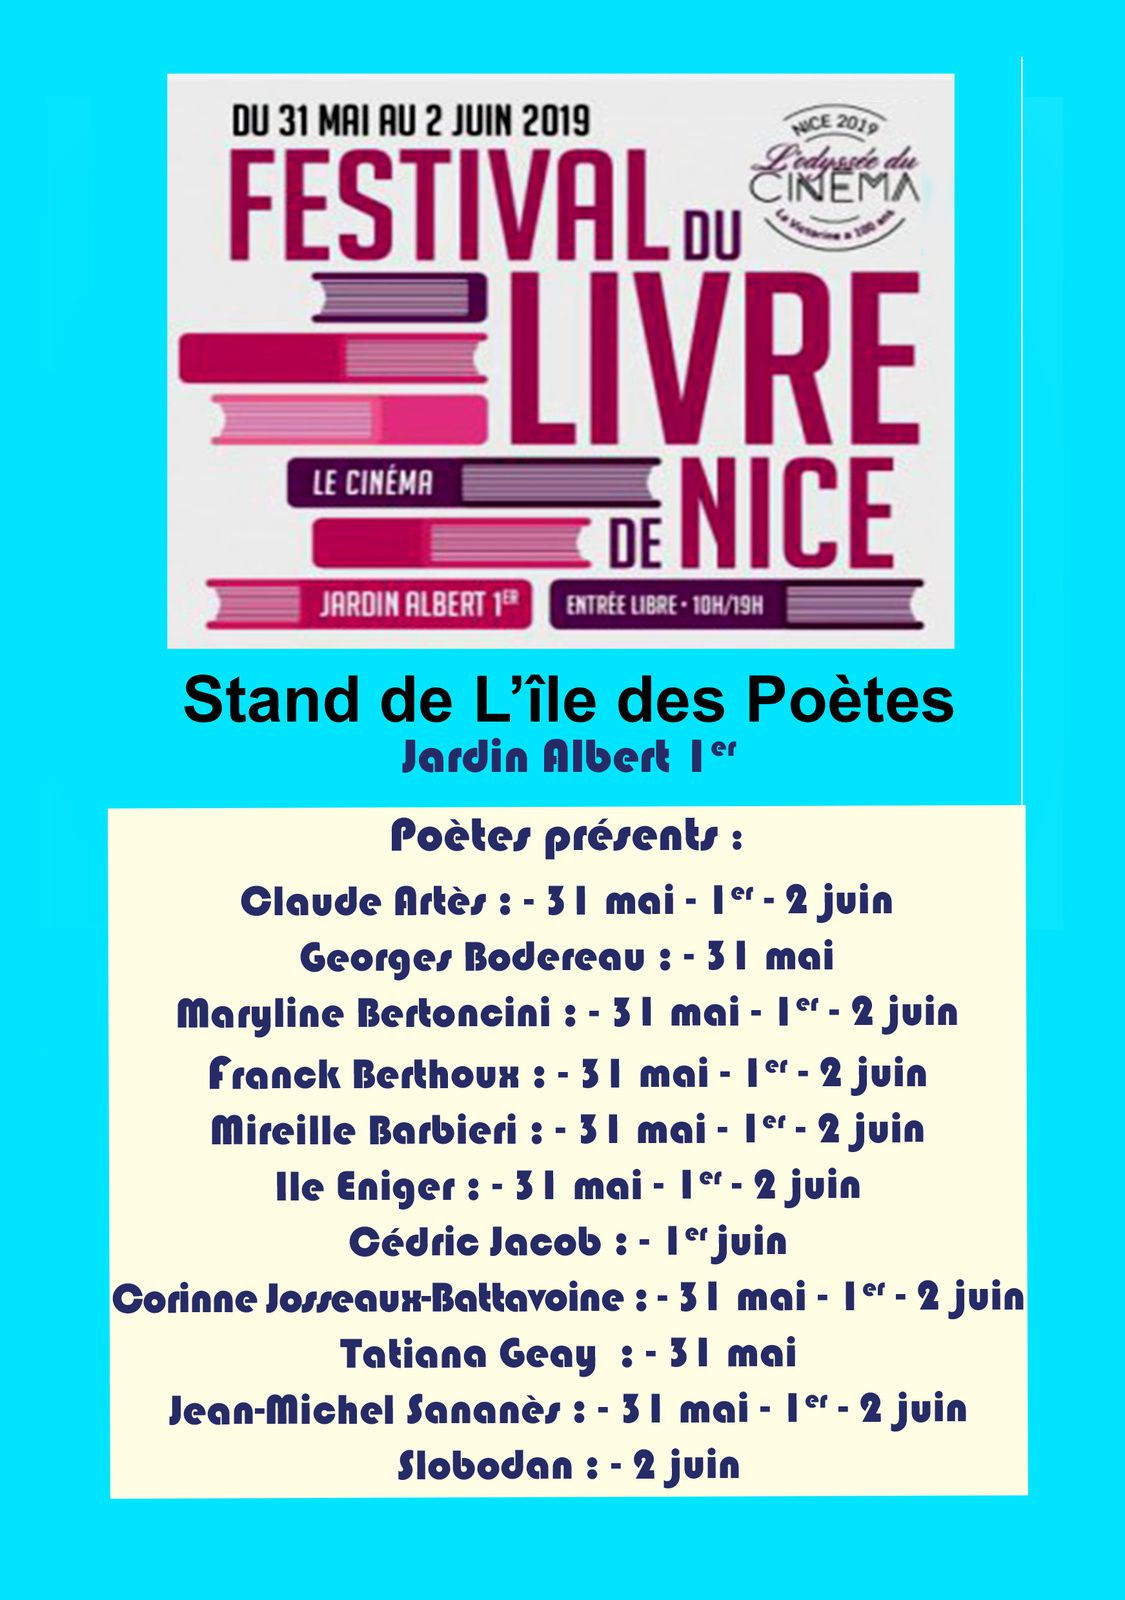 Festival du Livre de Nice - 31 mai, 1er et 2 juin 2019